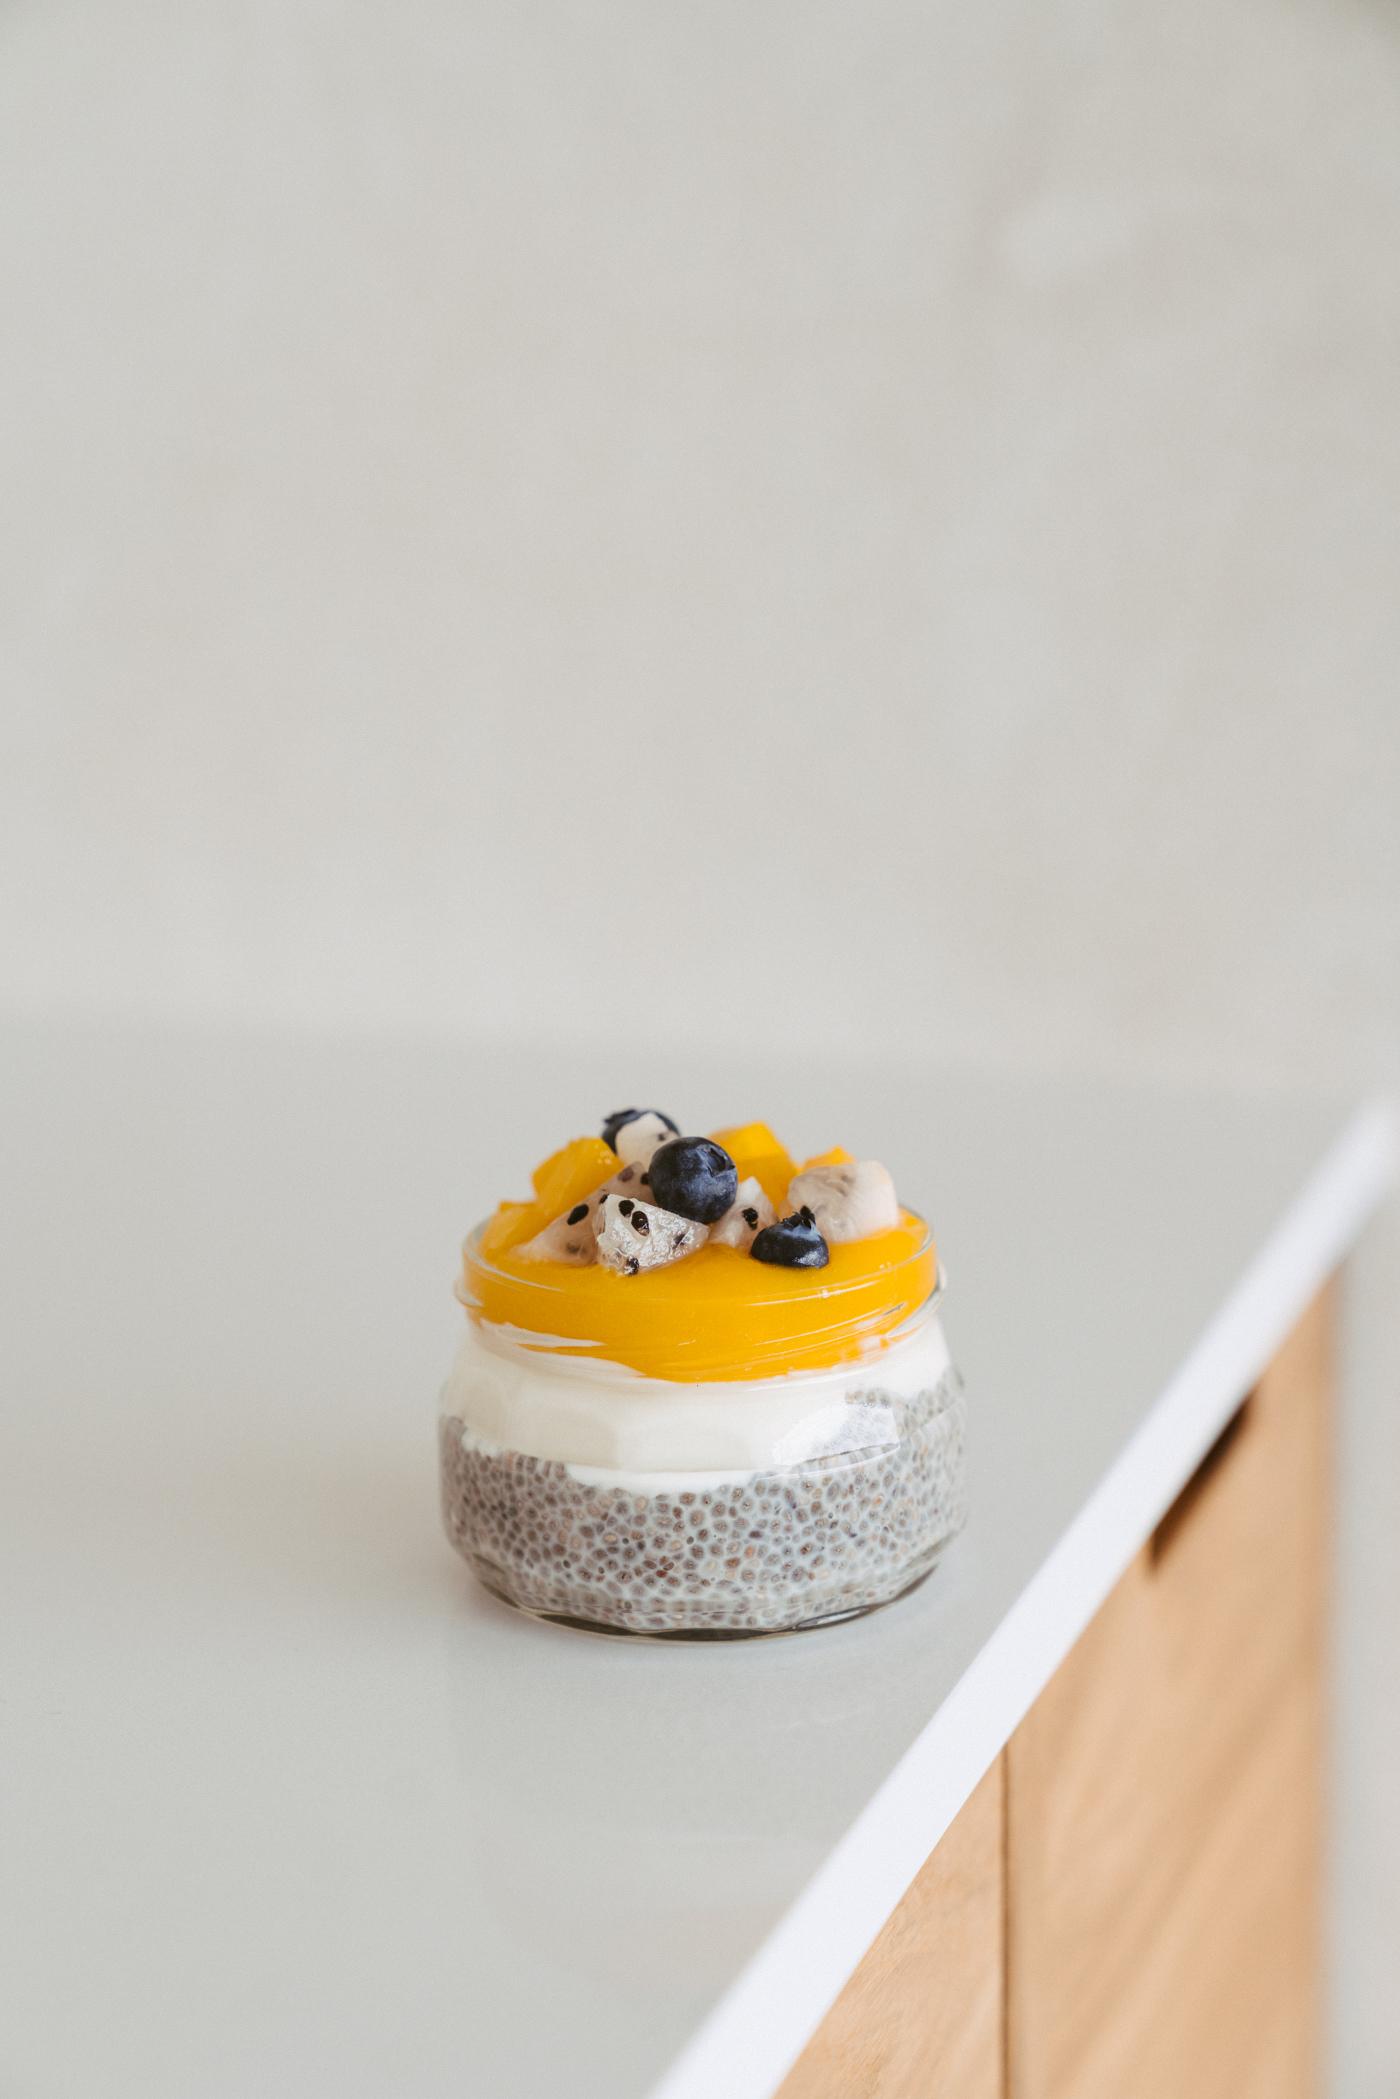 mango_passionfruit_chia_and_yoghurt_jars-4.jpg